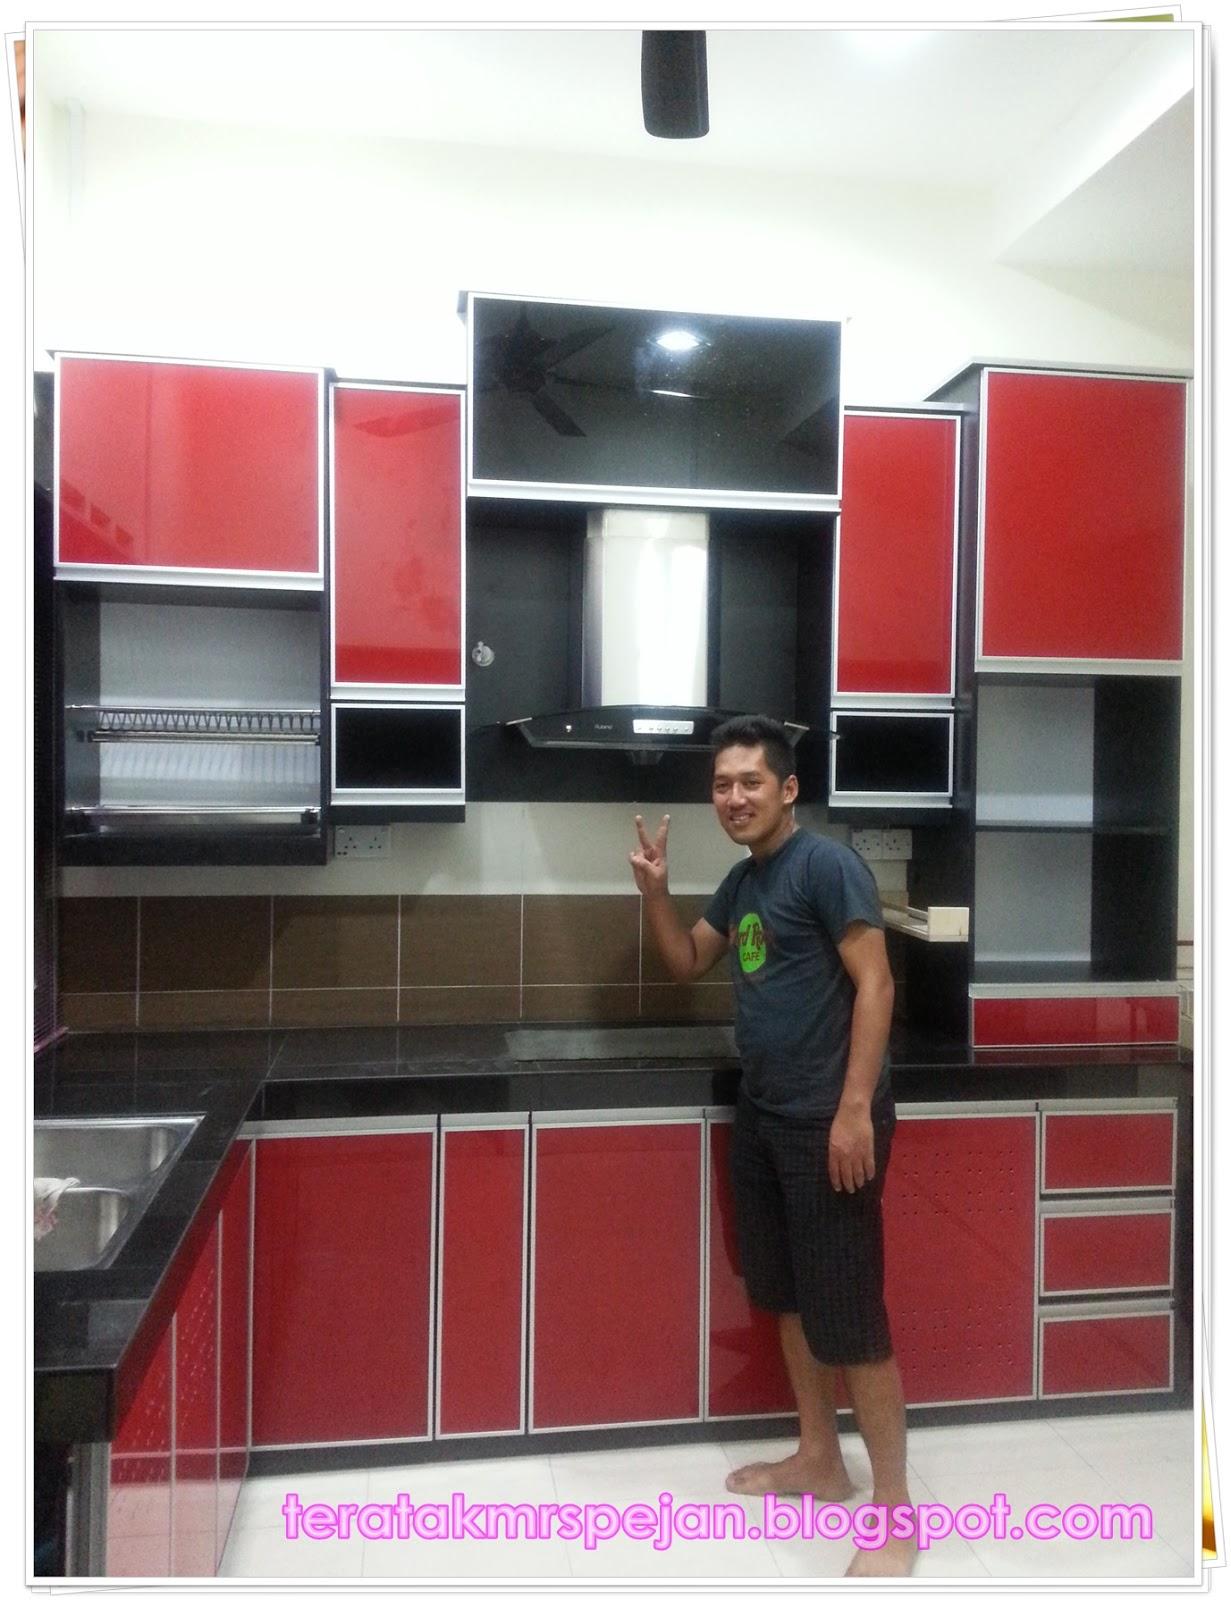 Dunia Mrs Pejan S Hasil Kitchen Cabinet 3g Yang Murah Cantik Kemas